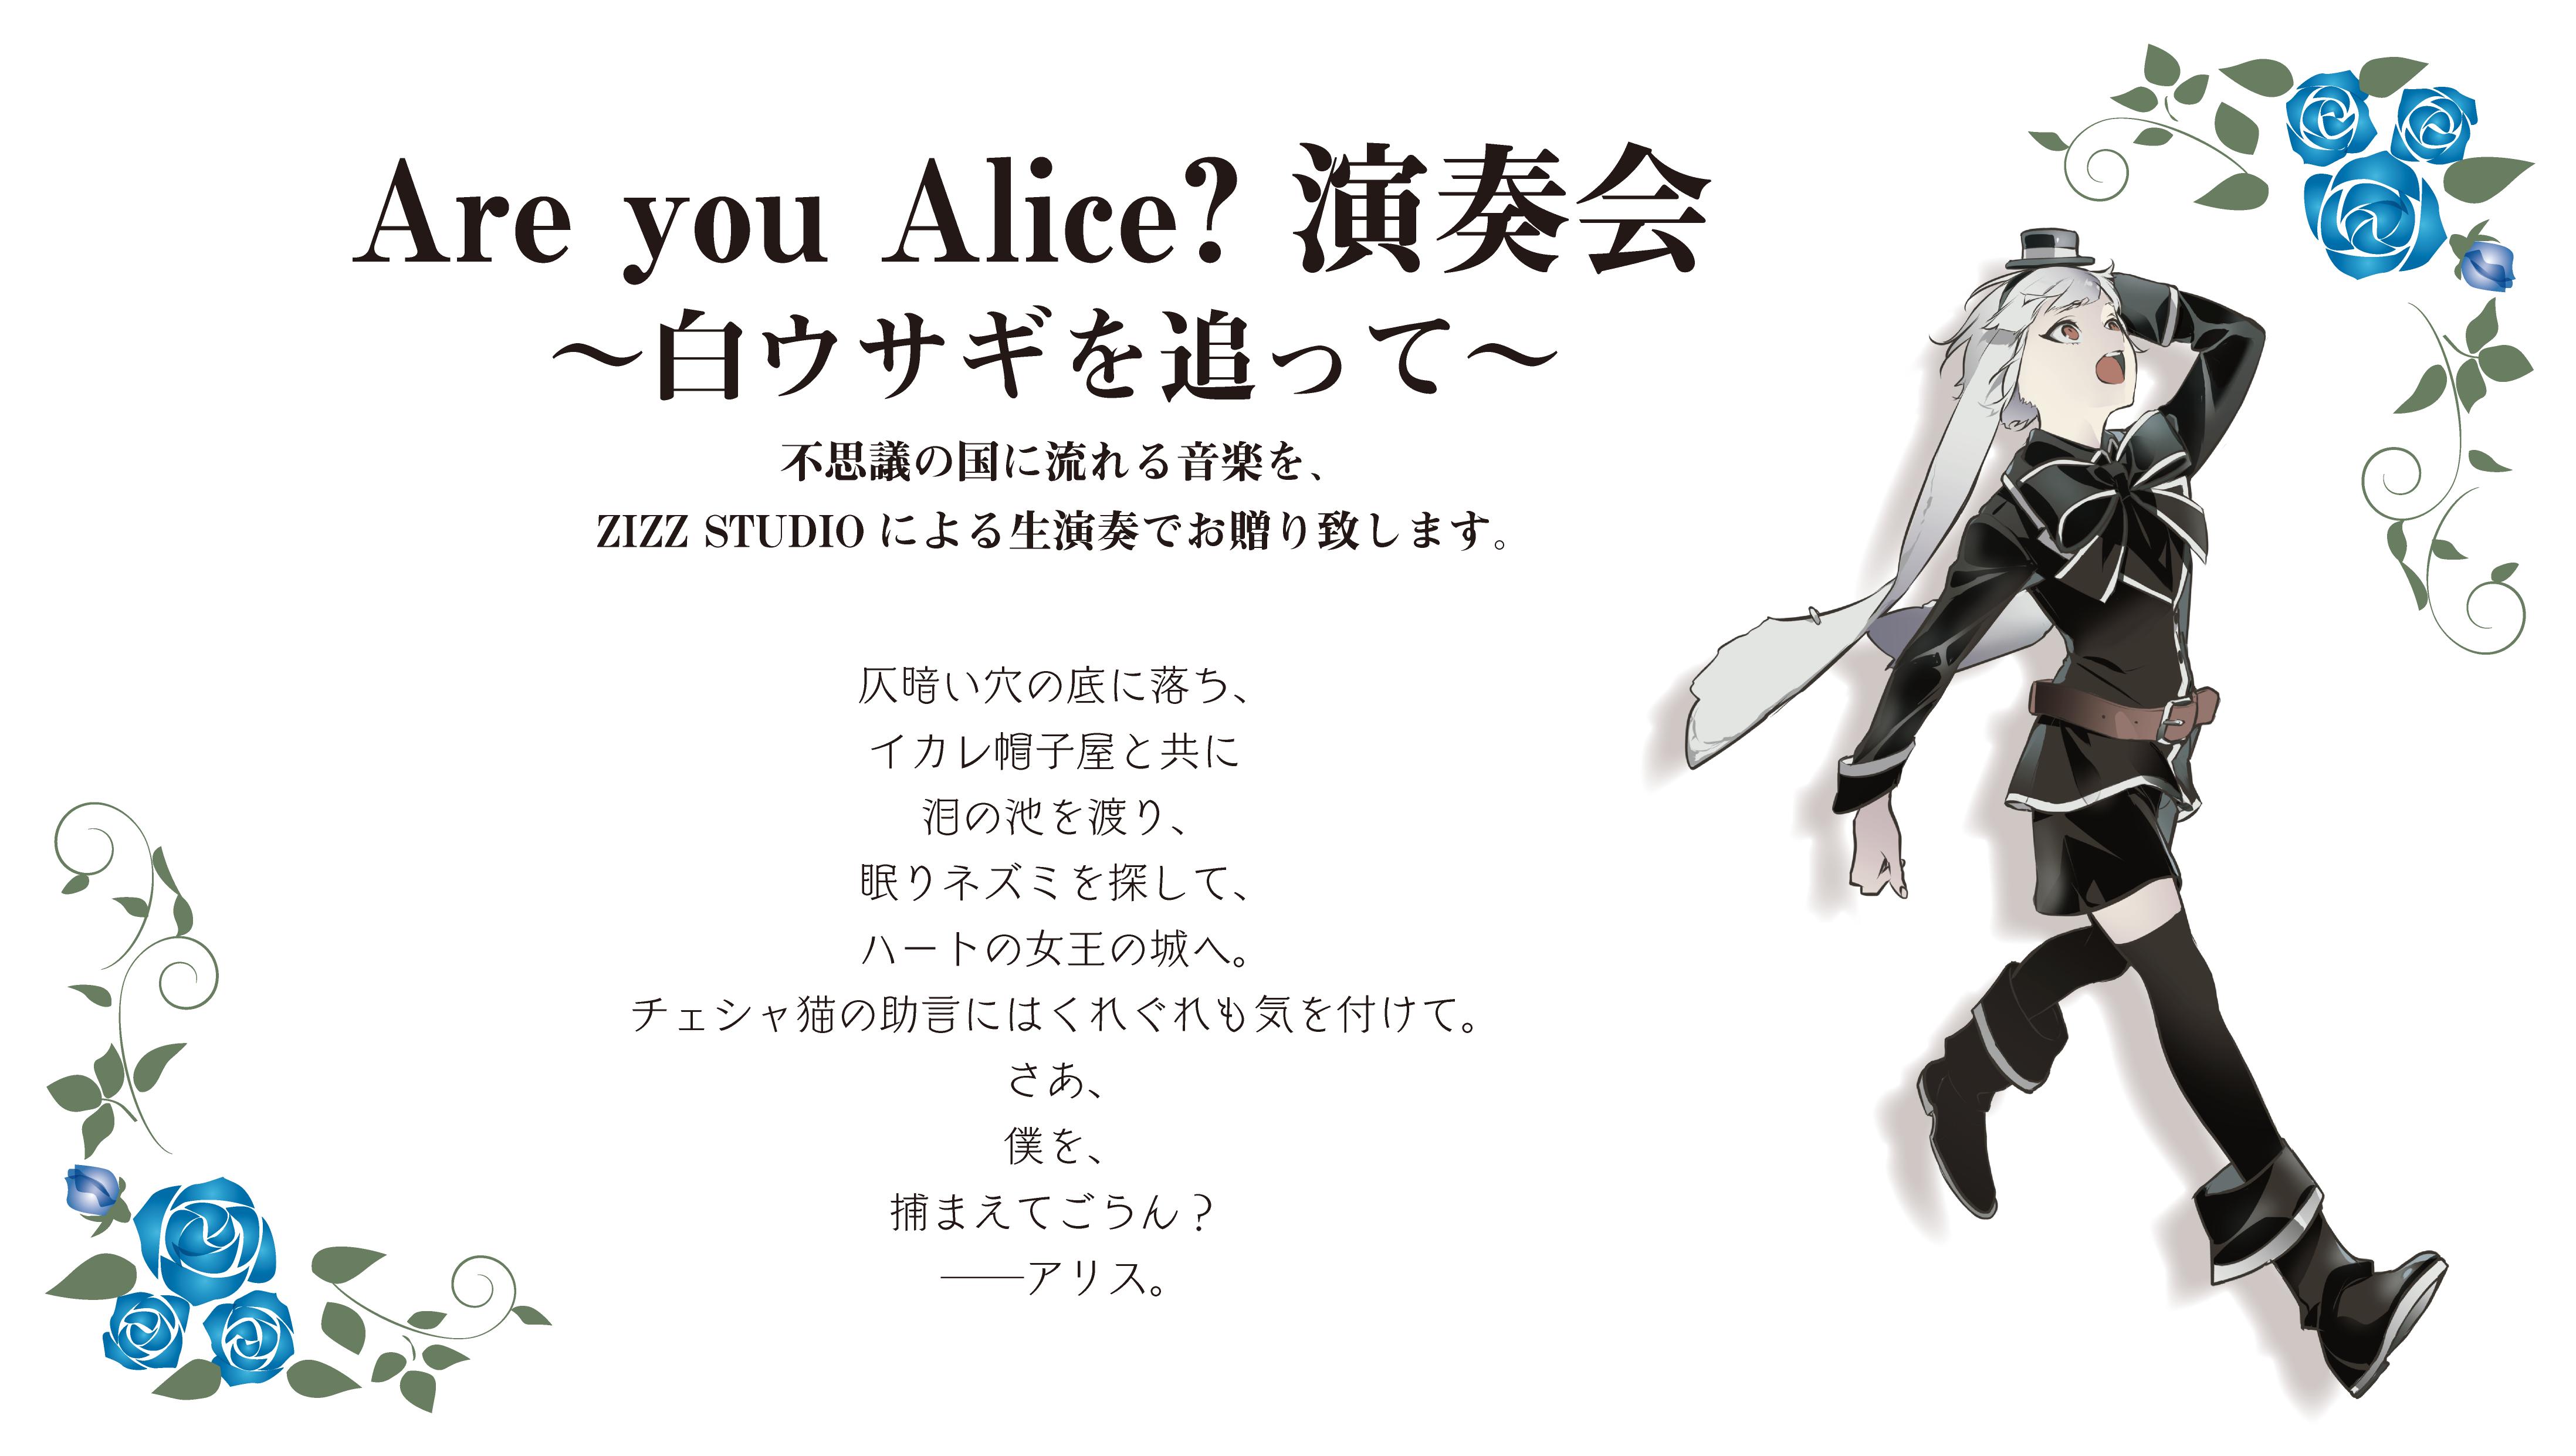 Are you Alice? 演奏会 ~白ウサギを追って~